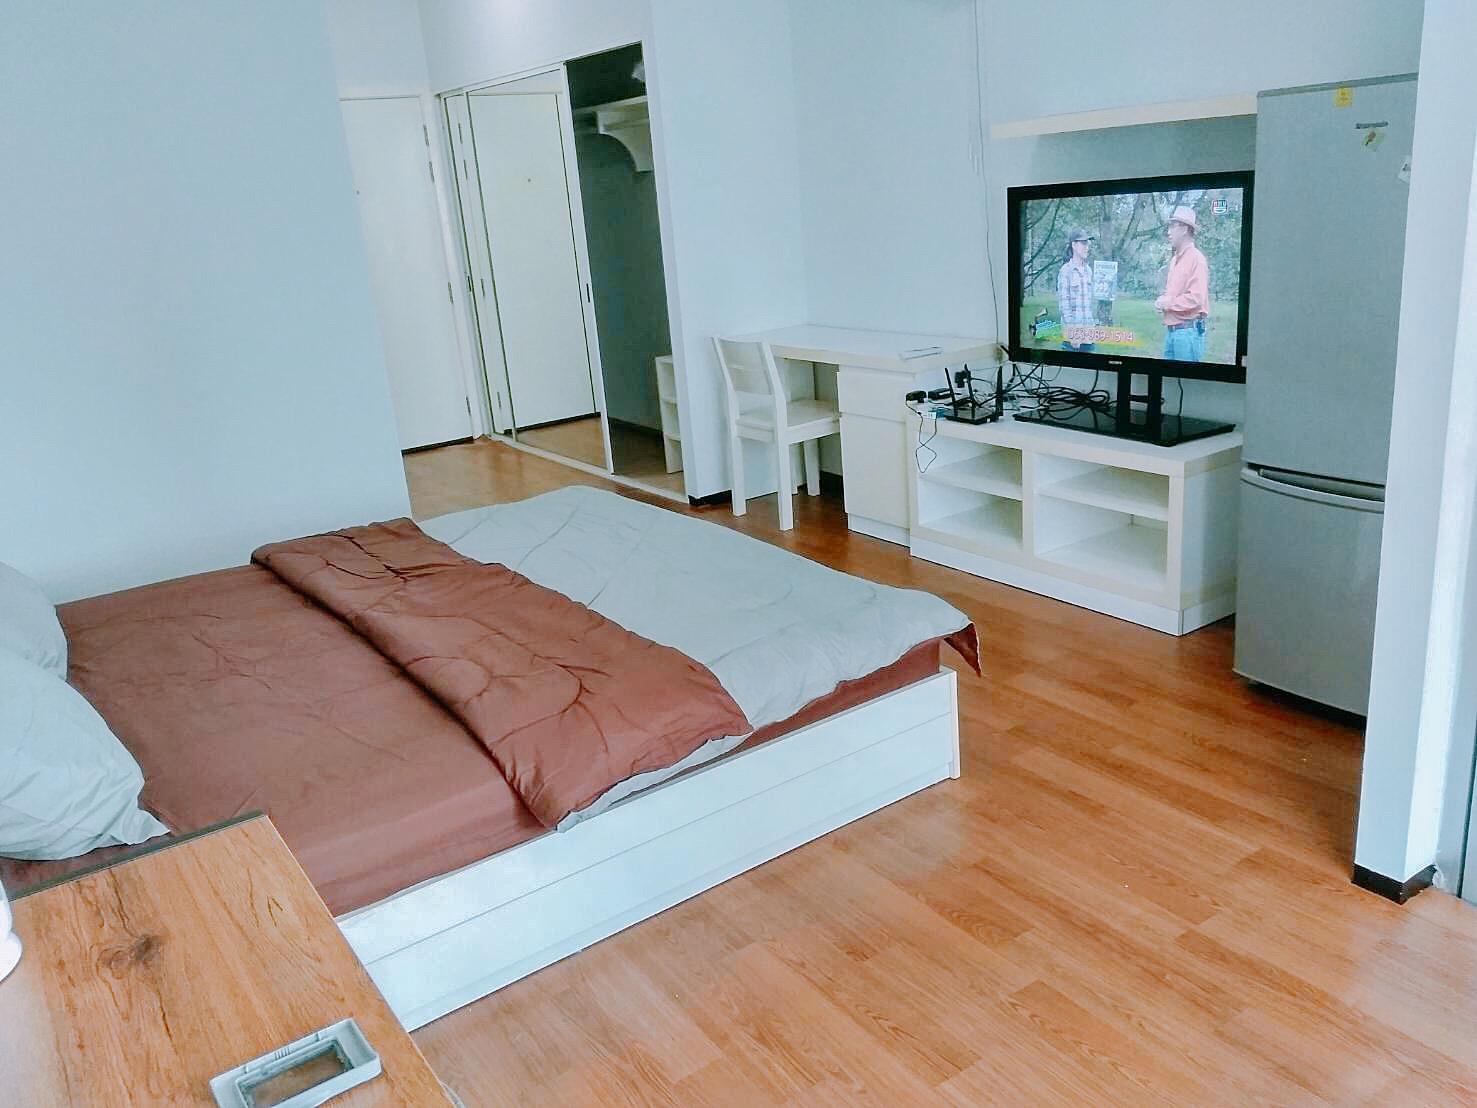 wattana bangkok stay hostel